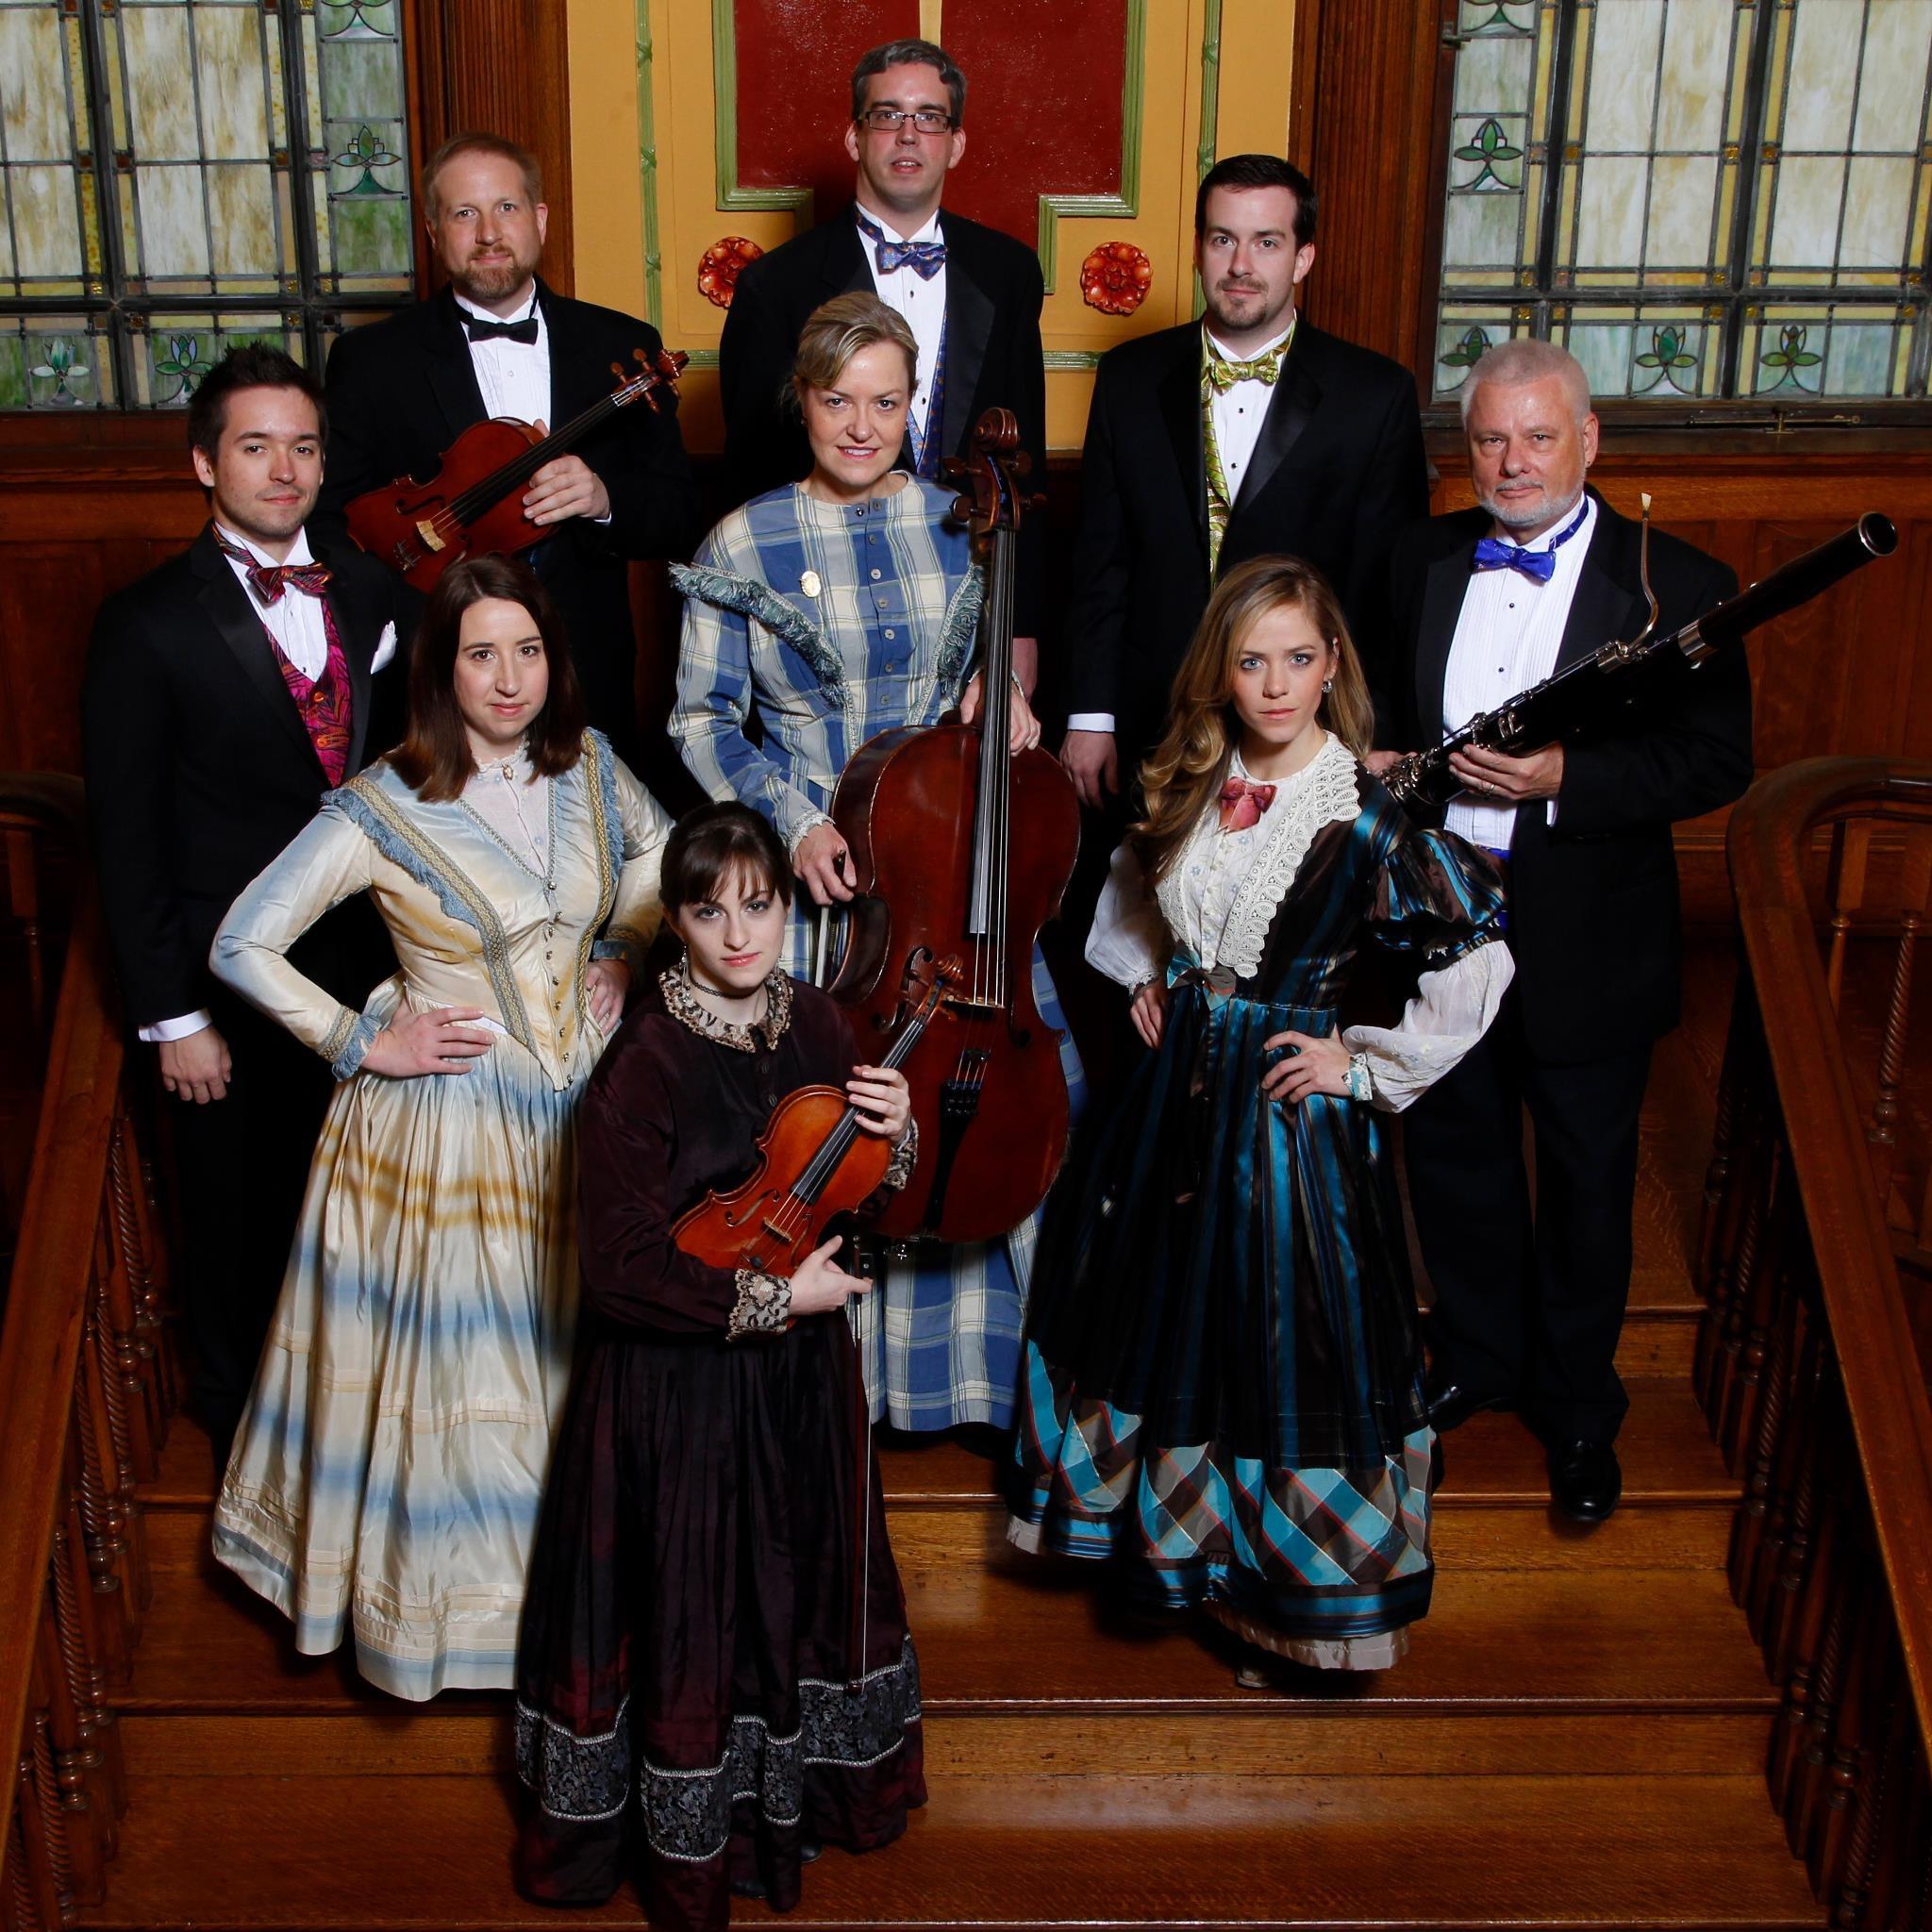 Soprano Artist in Hall Ensemble